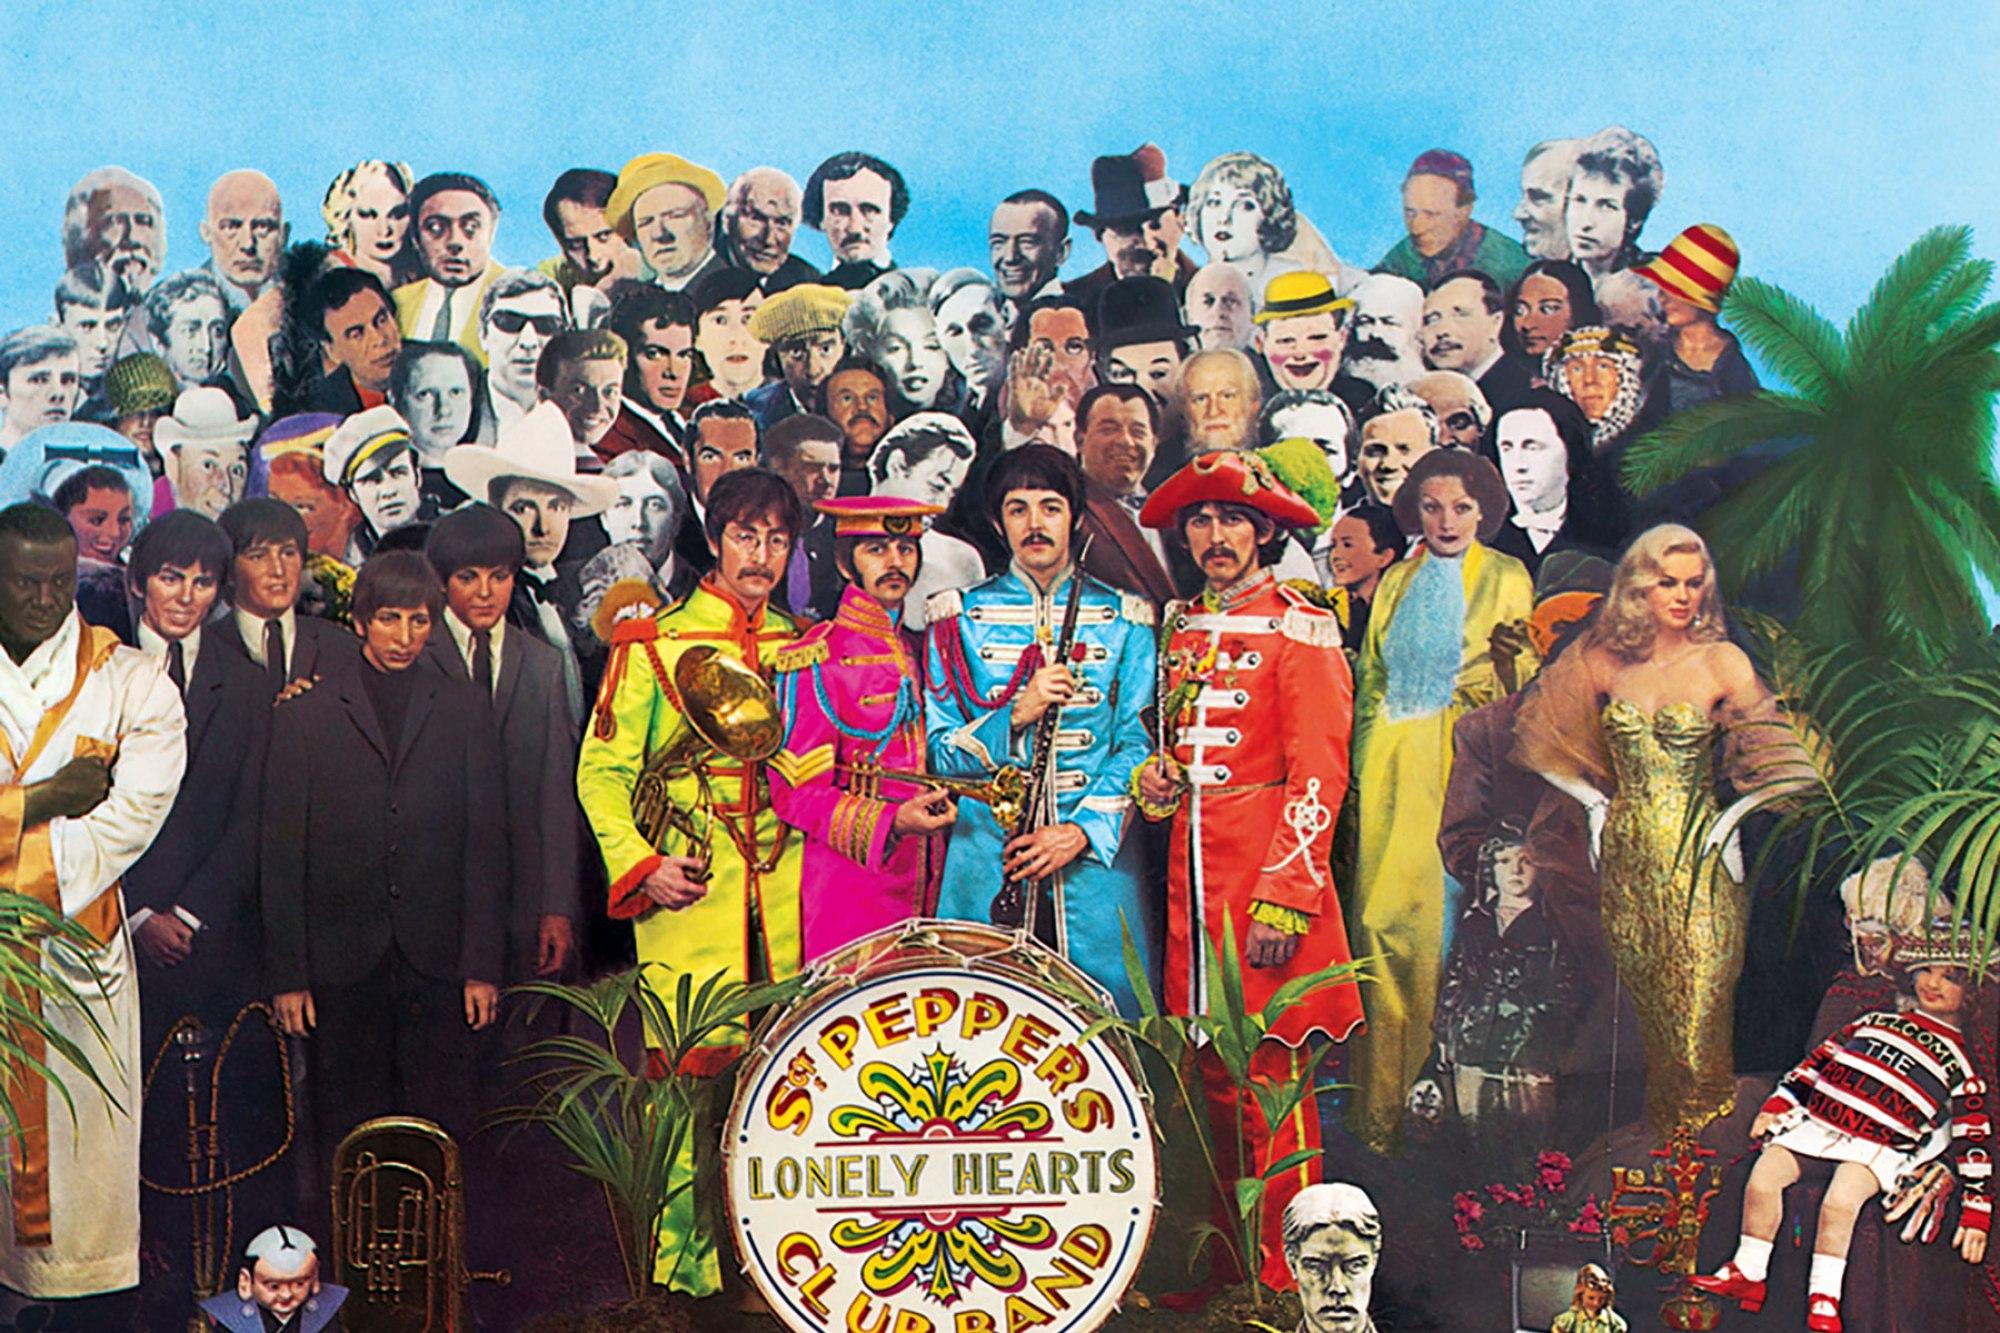 Sgt. Pepper's 50 years